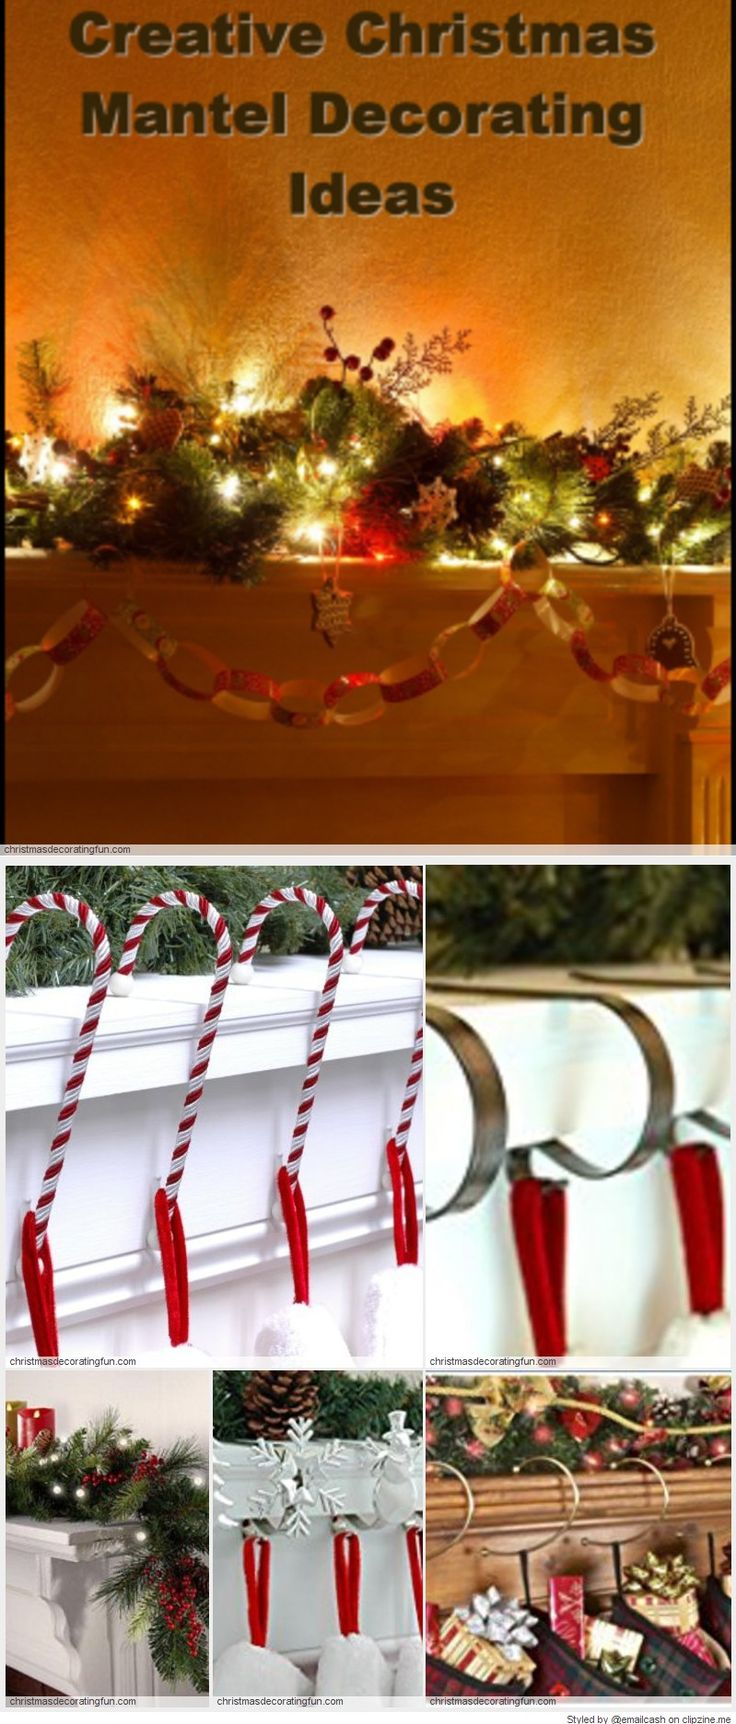 Stupell yorkie dog 3 panel decorative fireplace screen - Creative Christmas Mantel Decorating Ideas